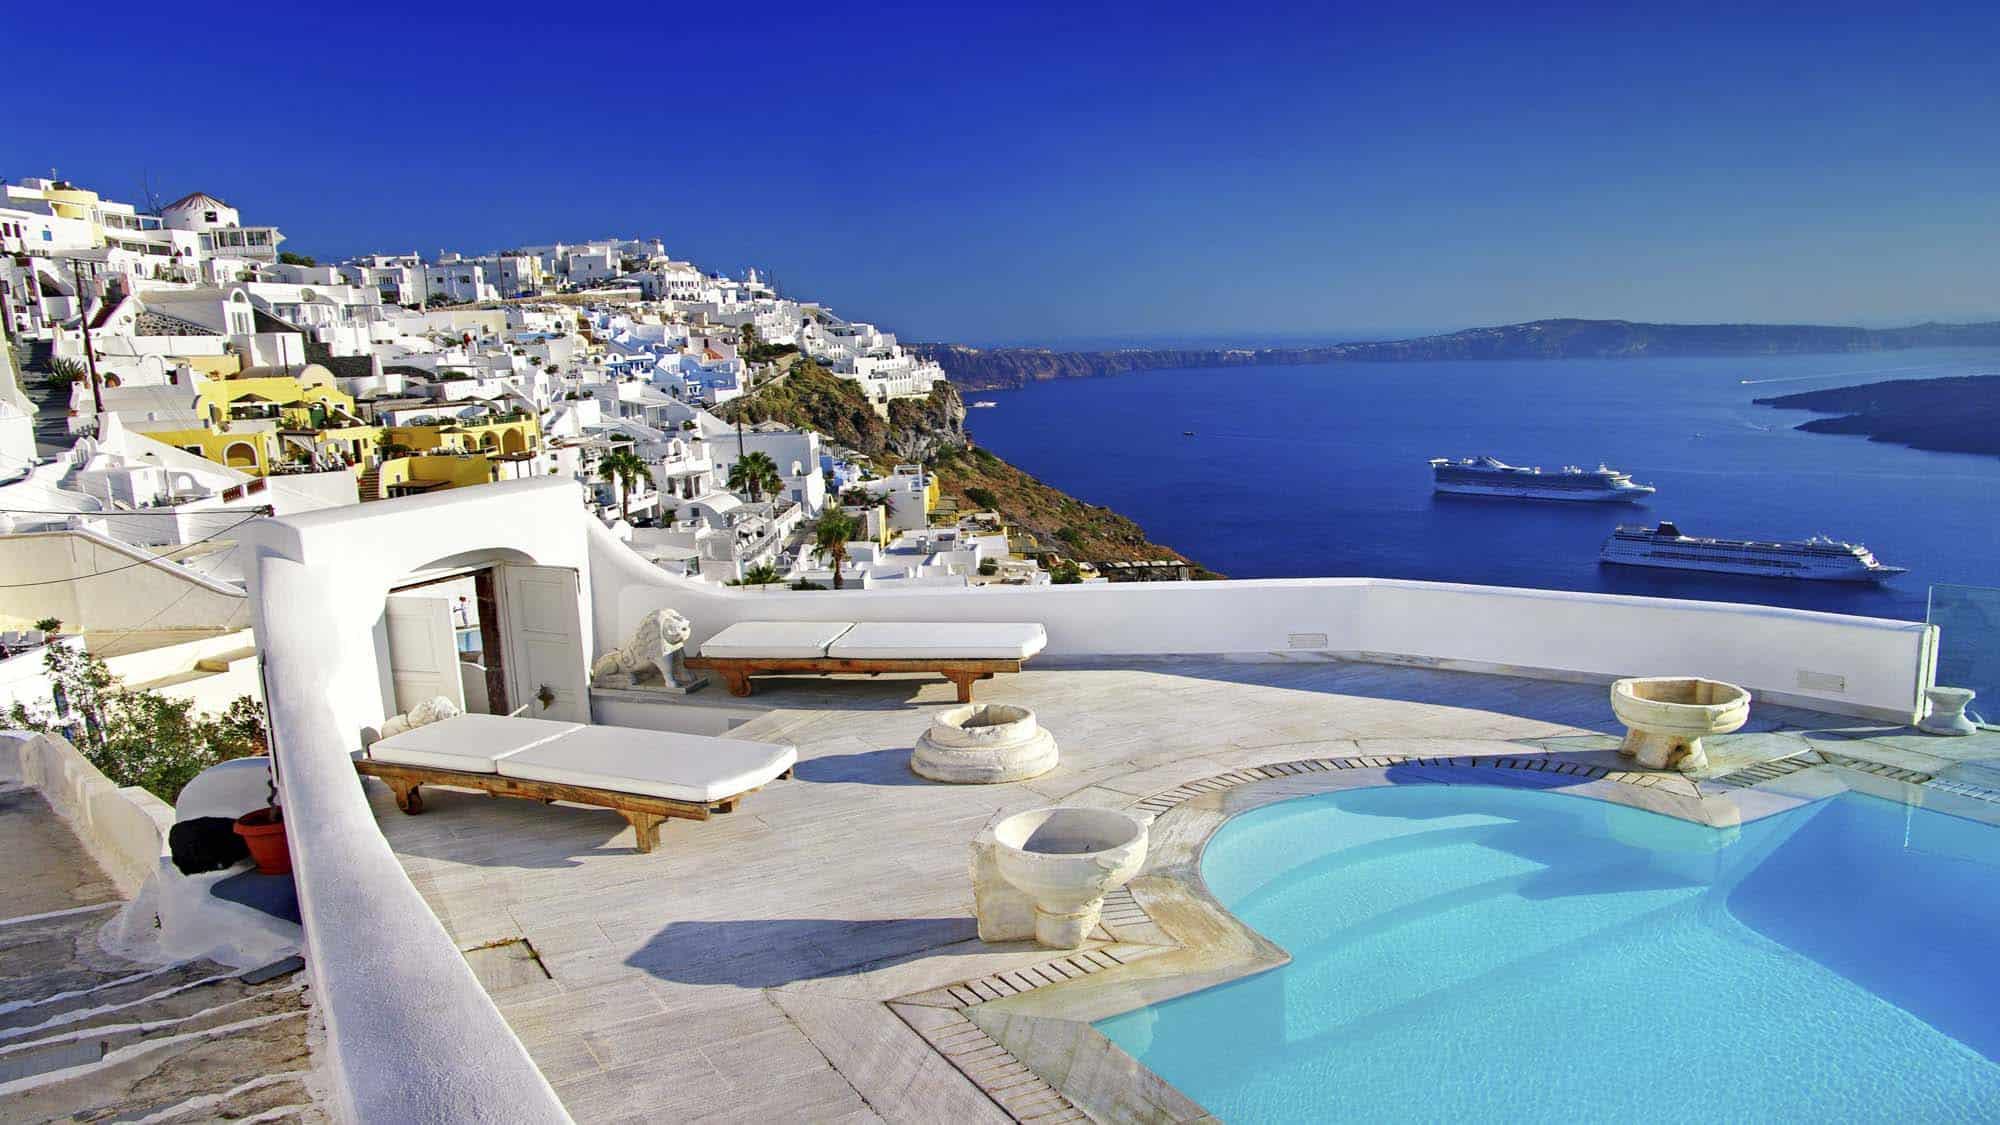 GreekIslands-Cruisepool_16_9